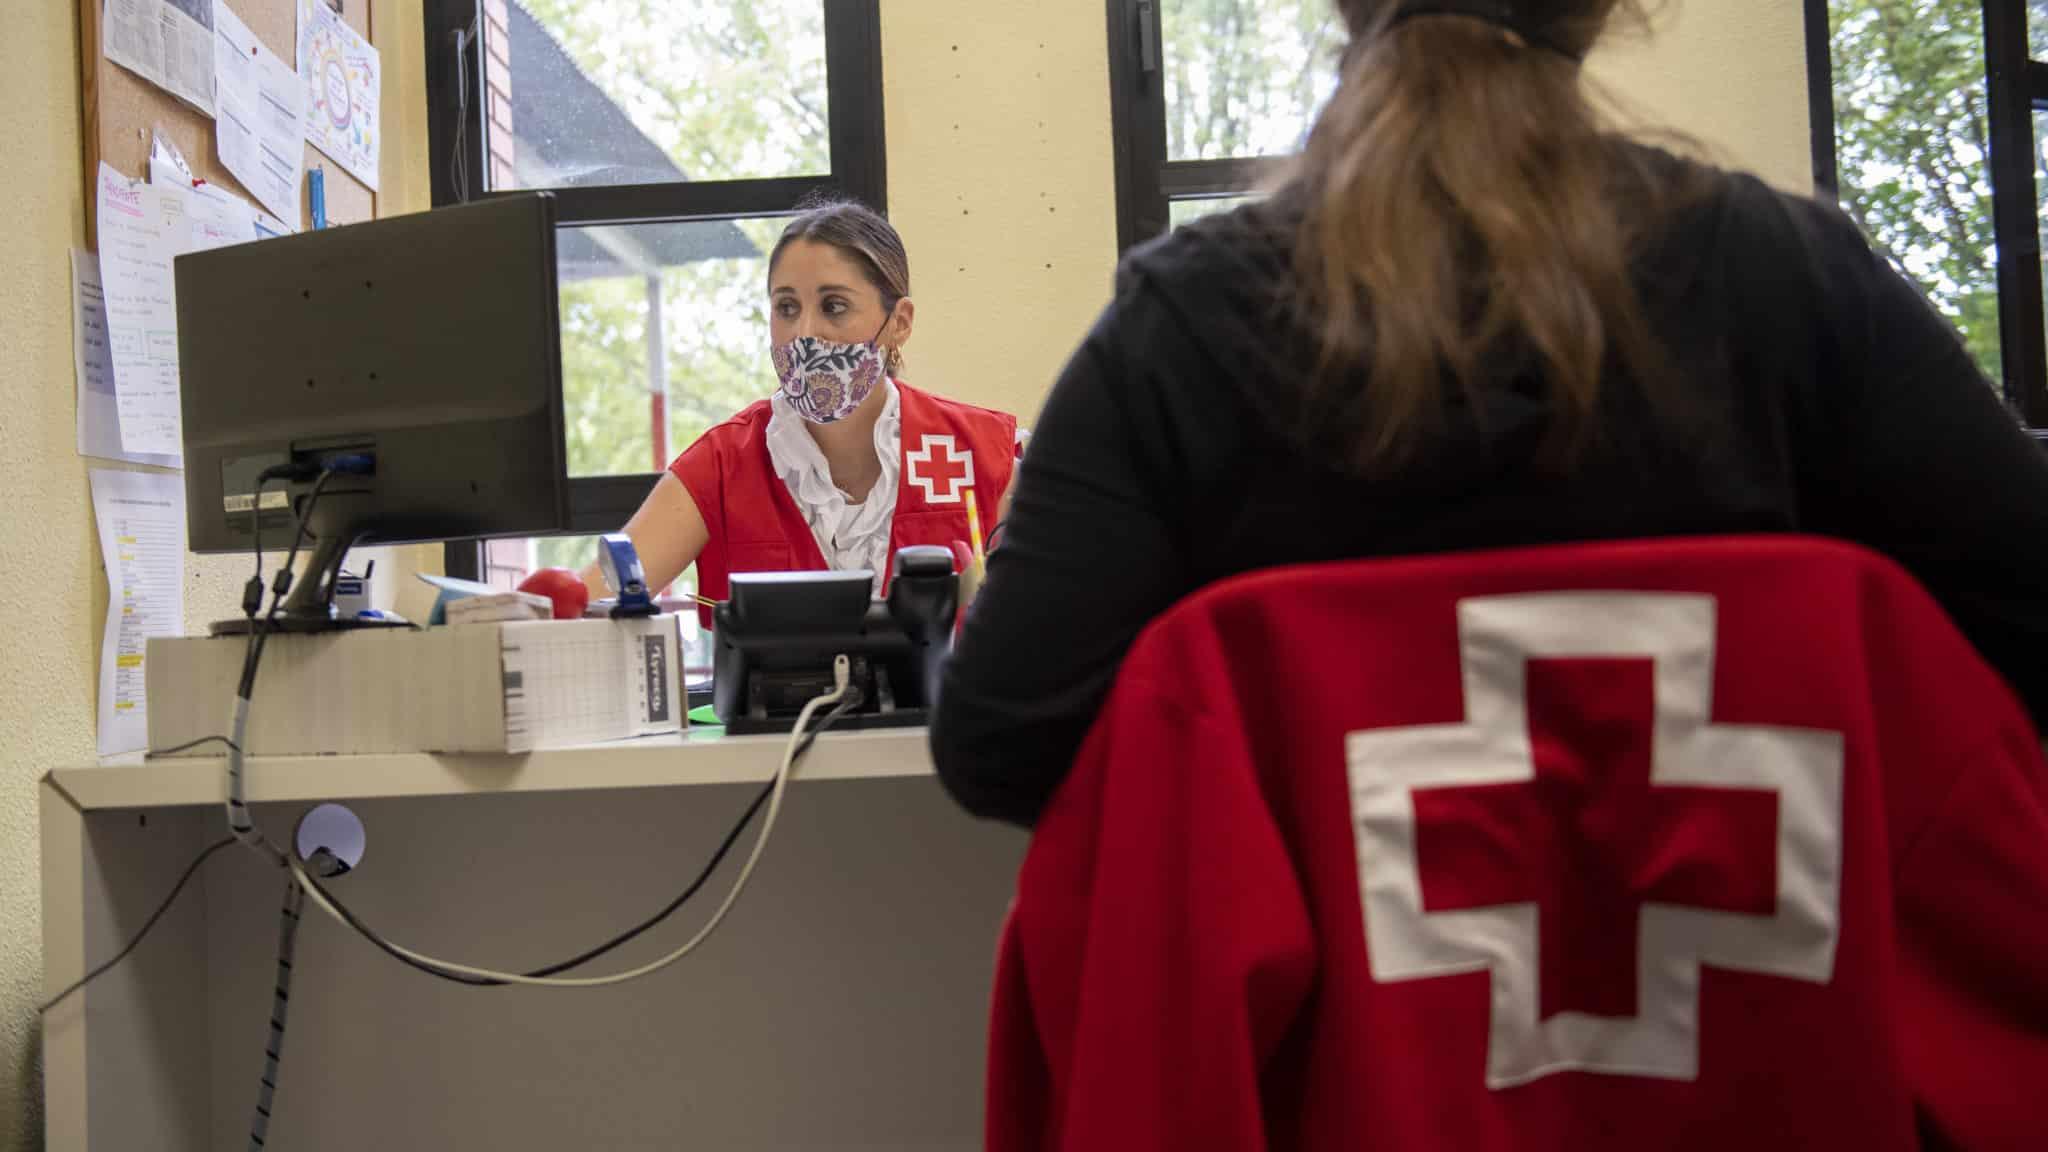 La presidenta Andreu agradece la labor de Cruz Roja durante la pandemia 1